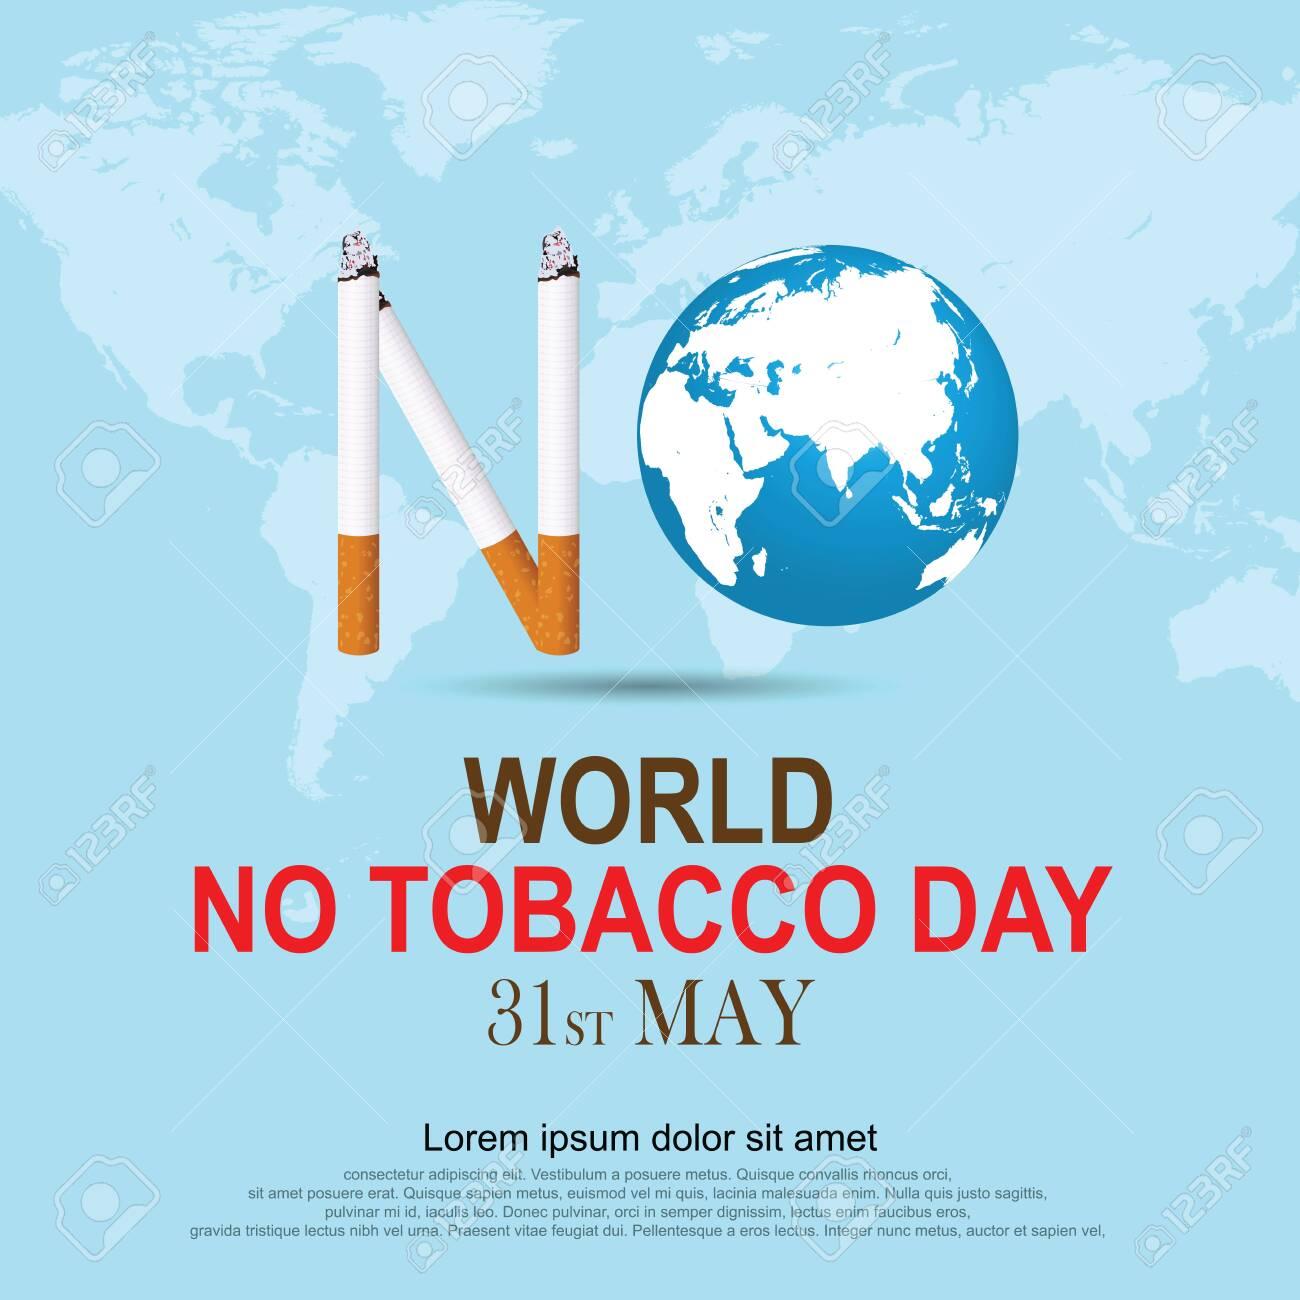 Stop Smoking. World No Tobacco Day. illustration Vector Eps 10. - 124351369